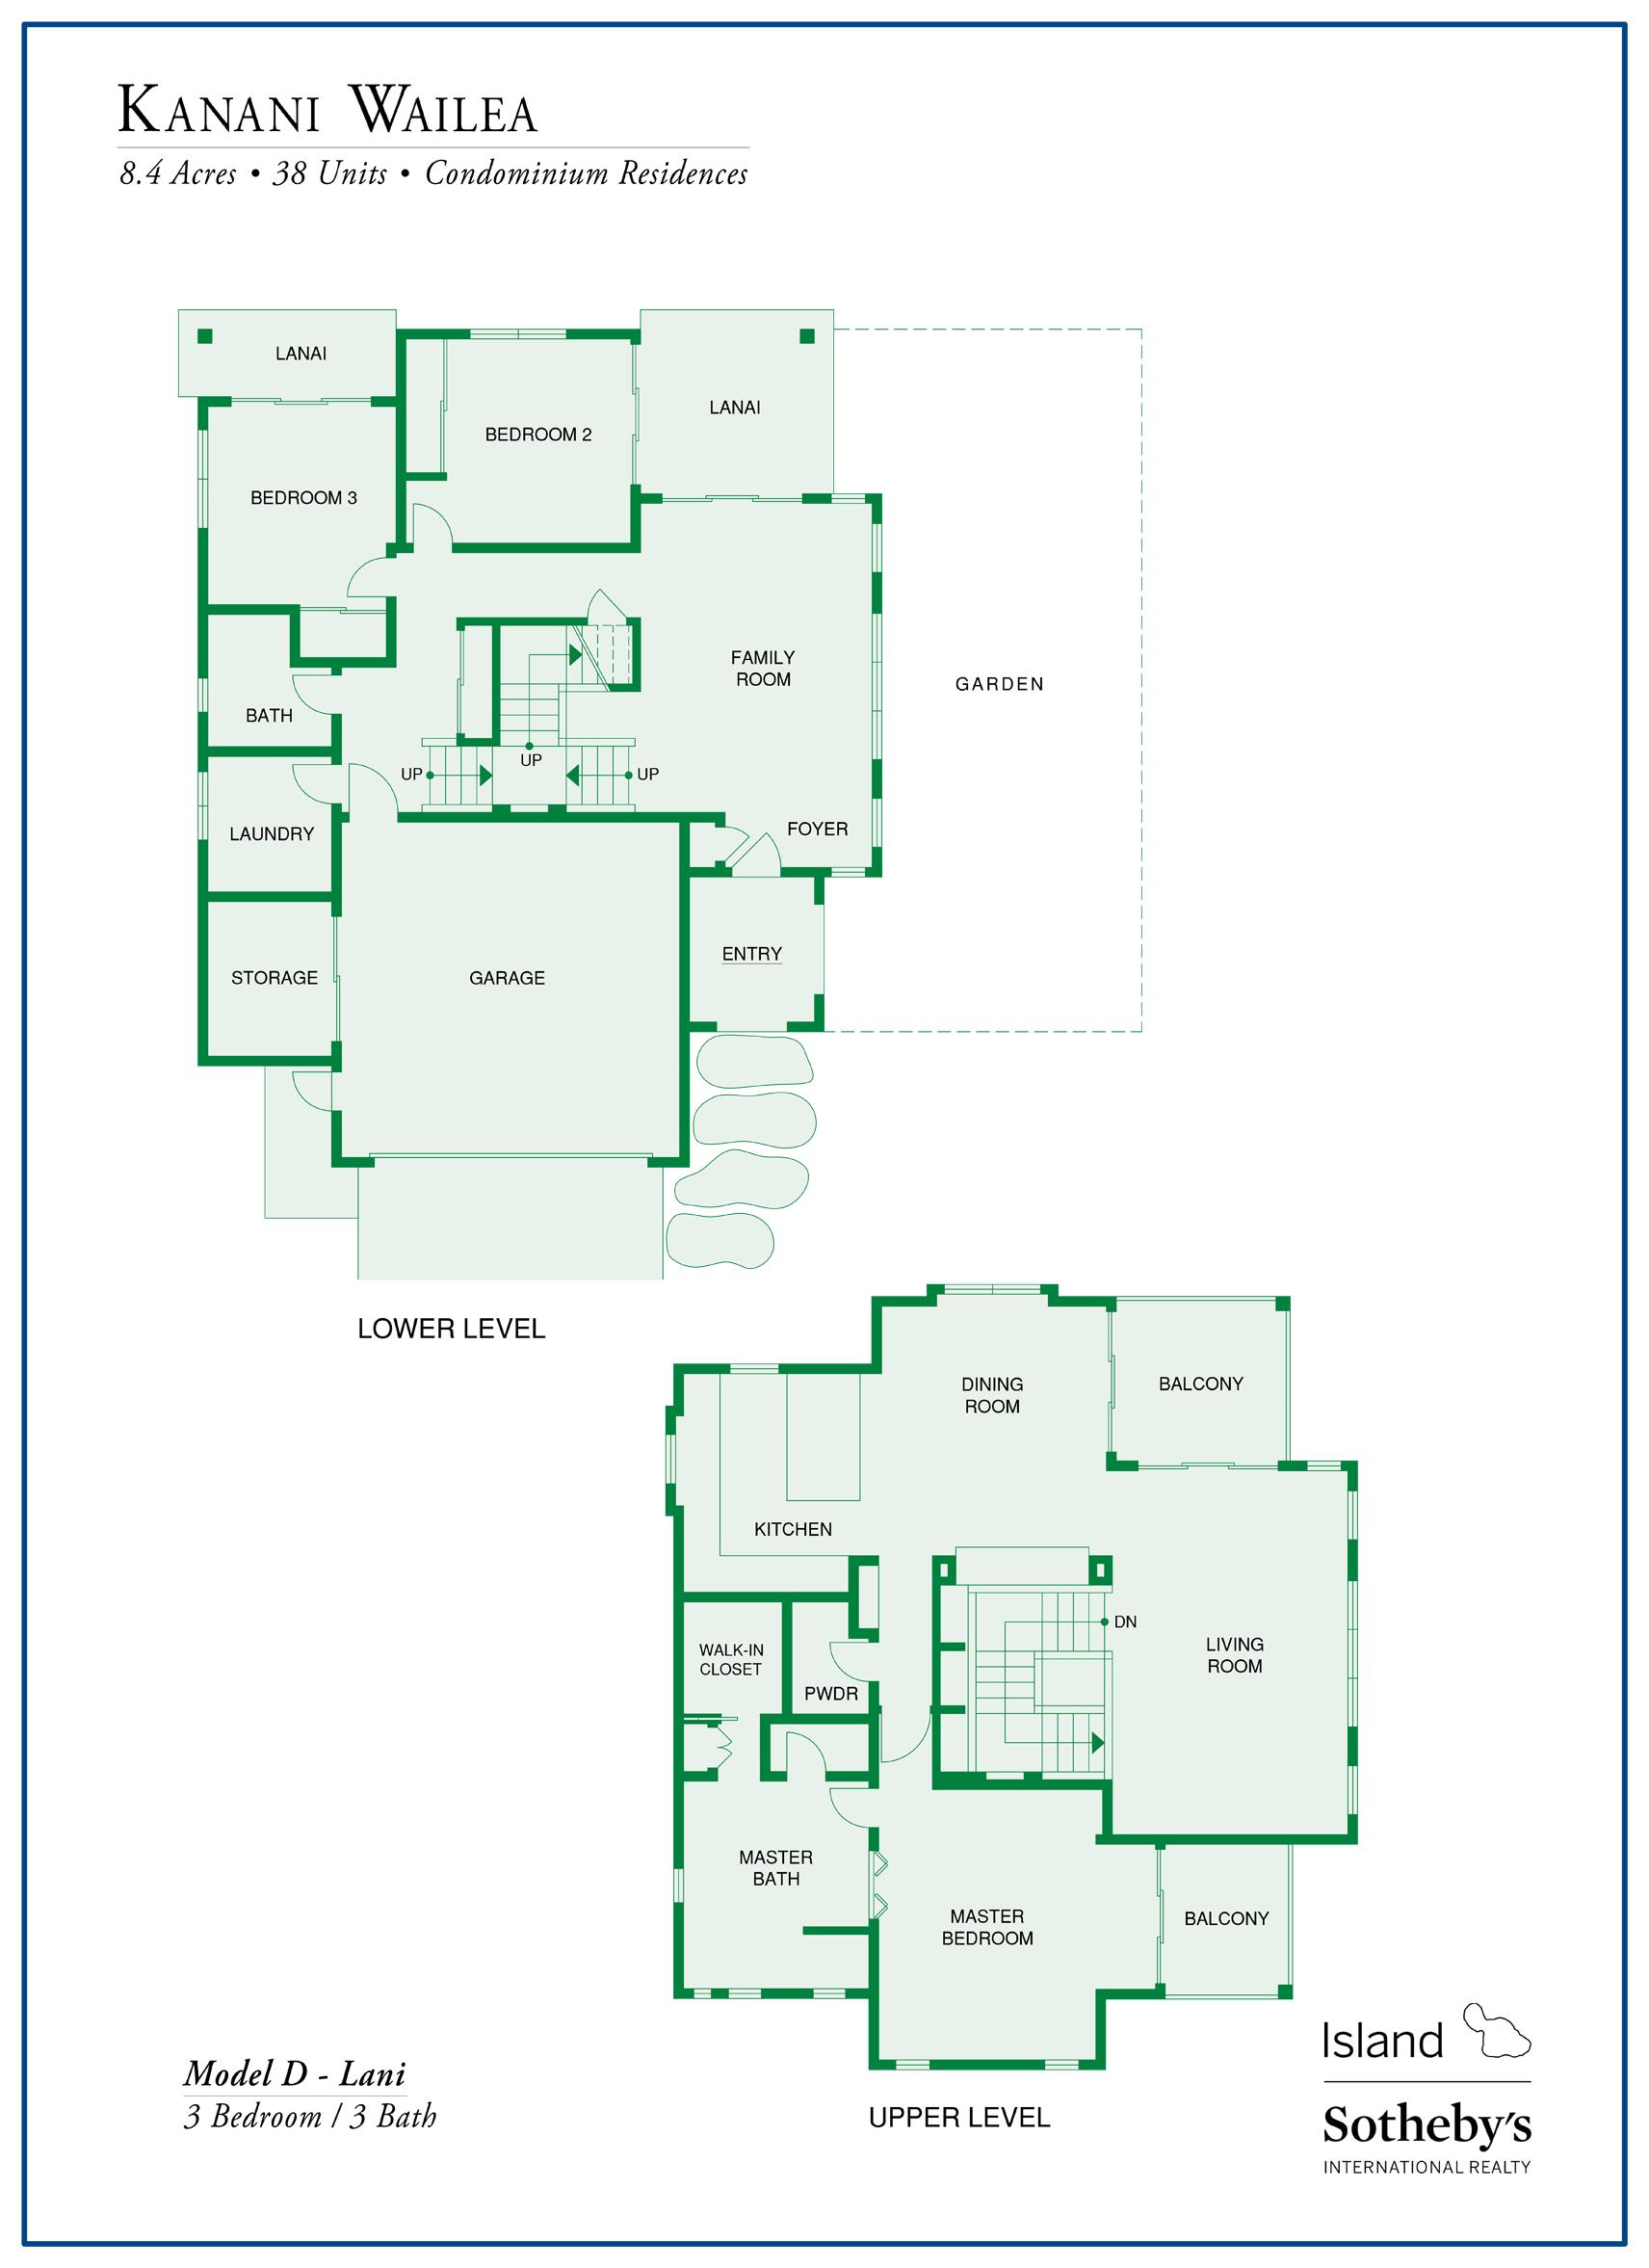 Marriott Residence Inn Floor Plans Kanani Wailea For Sale 5 Condos Average 997k